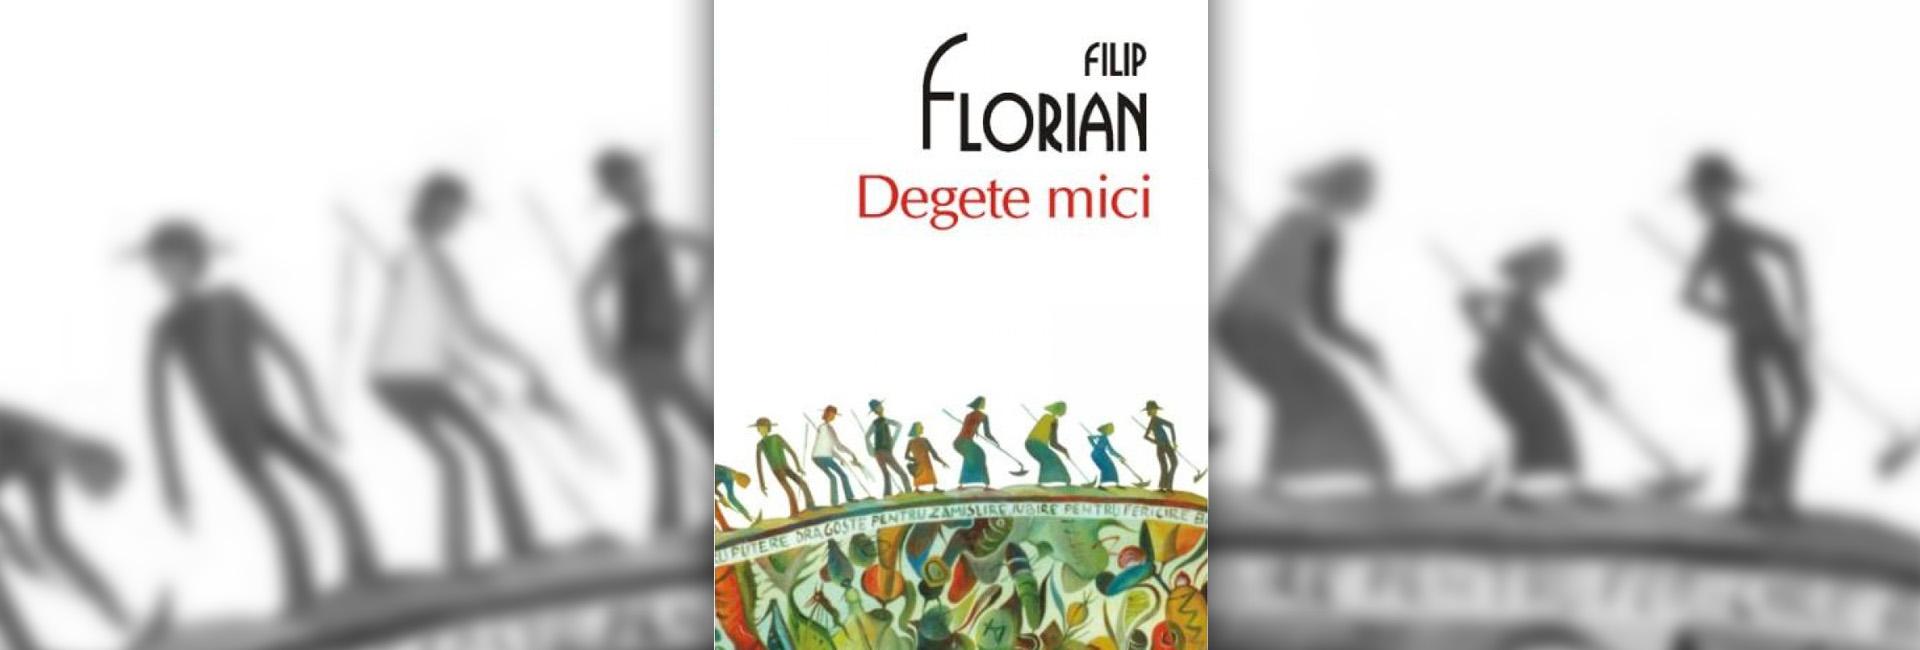 Degete mici Filip Florian carte autori români recenzie slider